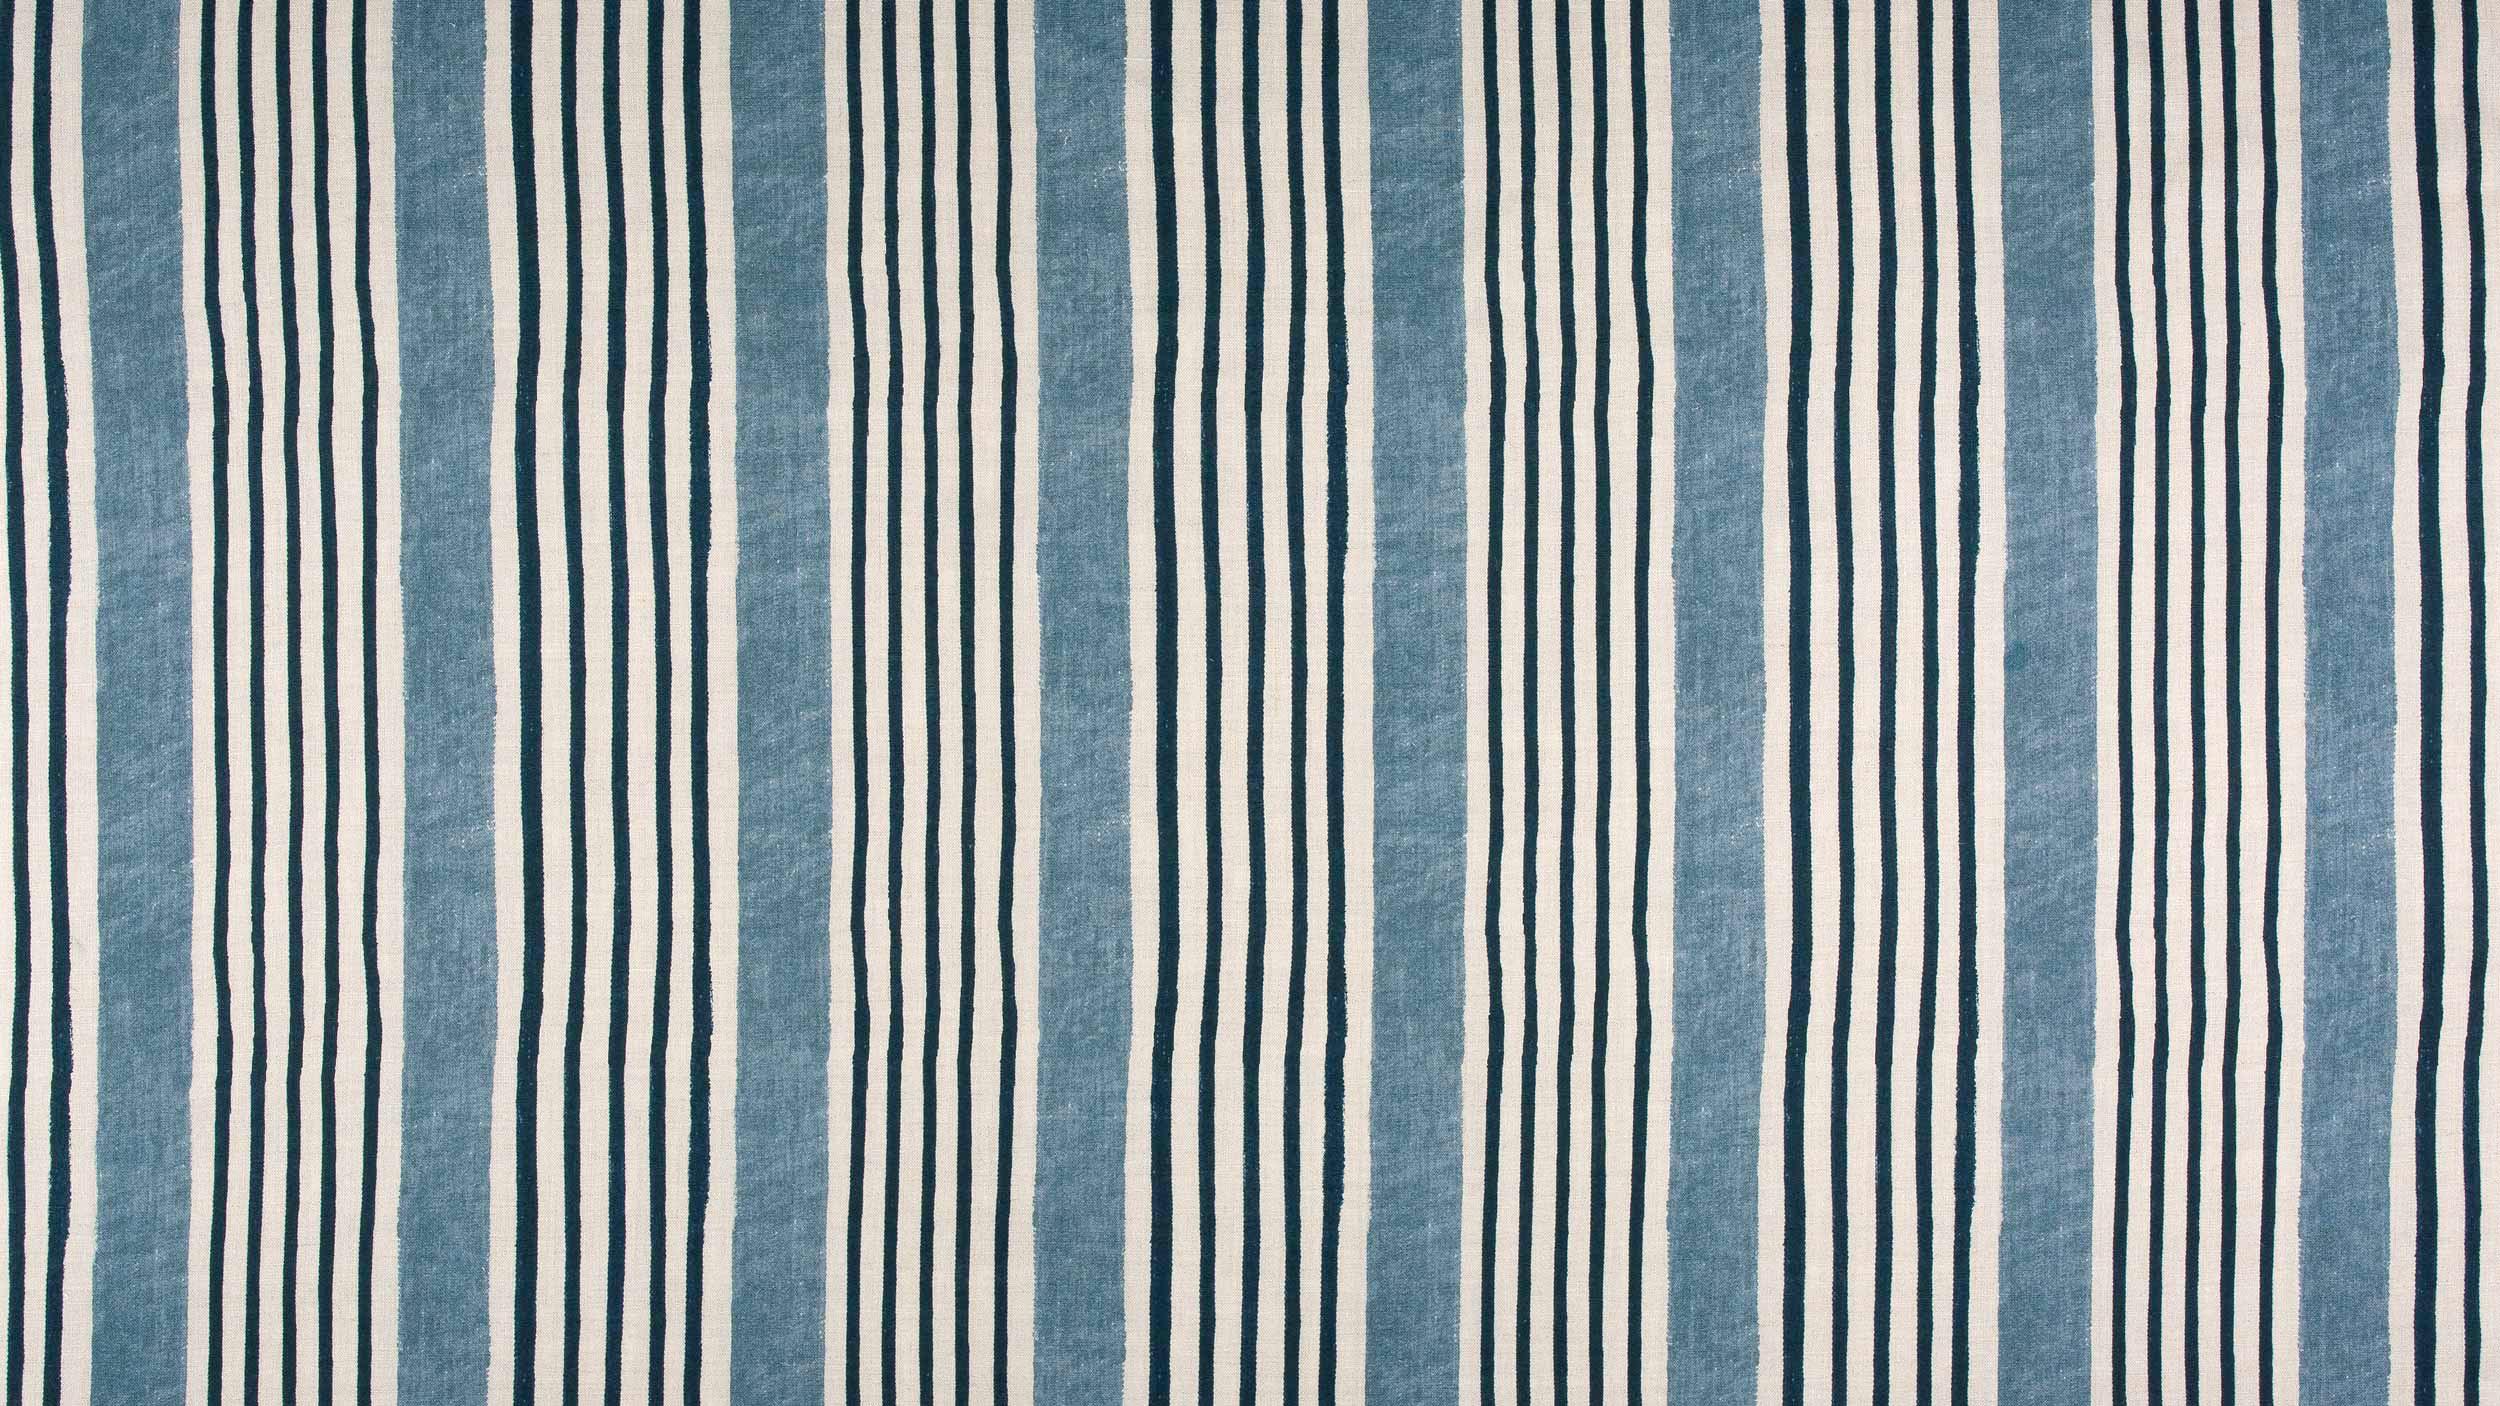 Clay_McLaurin_Studio_Andes-Stripe_Indigo_web.jpg